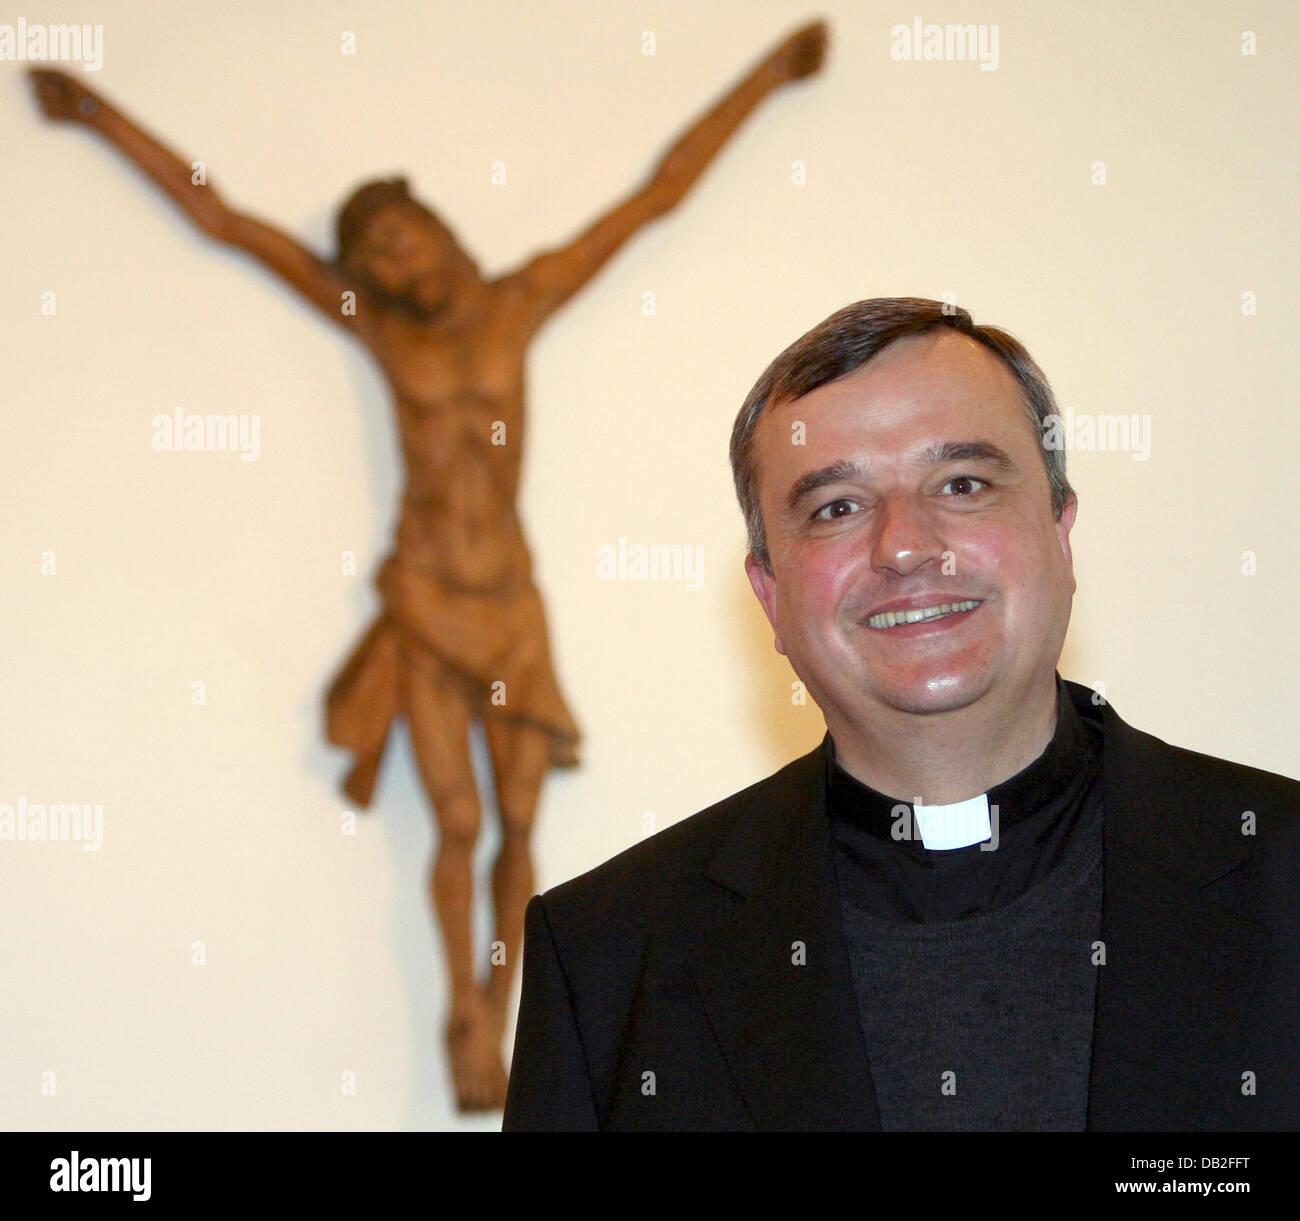 Suffragan Karl-Heinz Wiesemann is pictured in Paderborn, Germany, 19 December 2007. 47-year-old Wiesemann will become - Stock Image